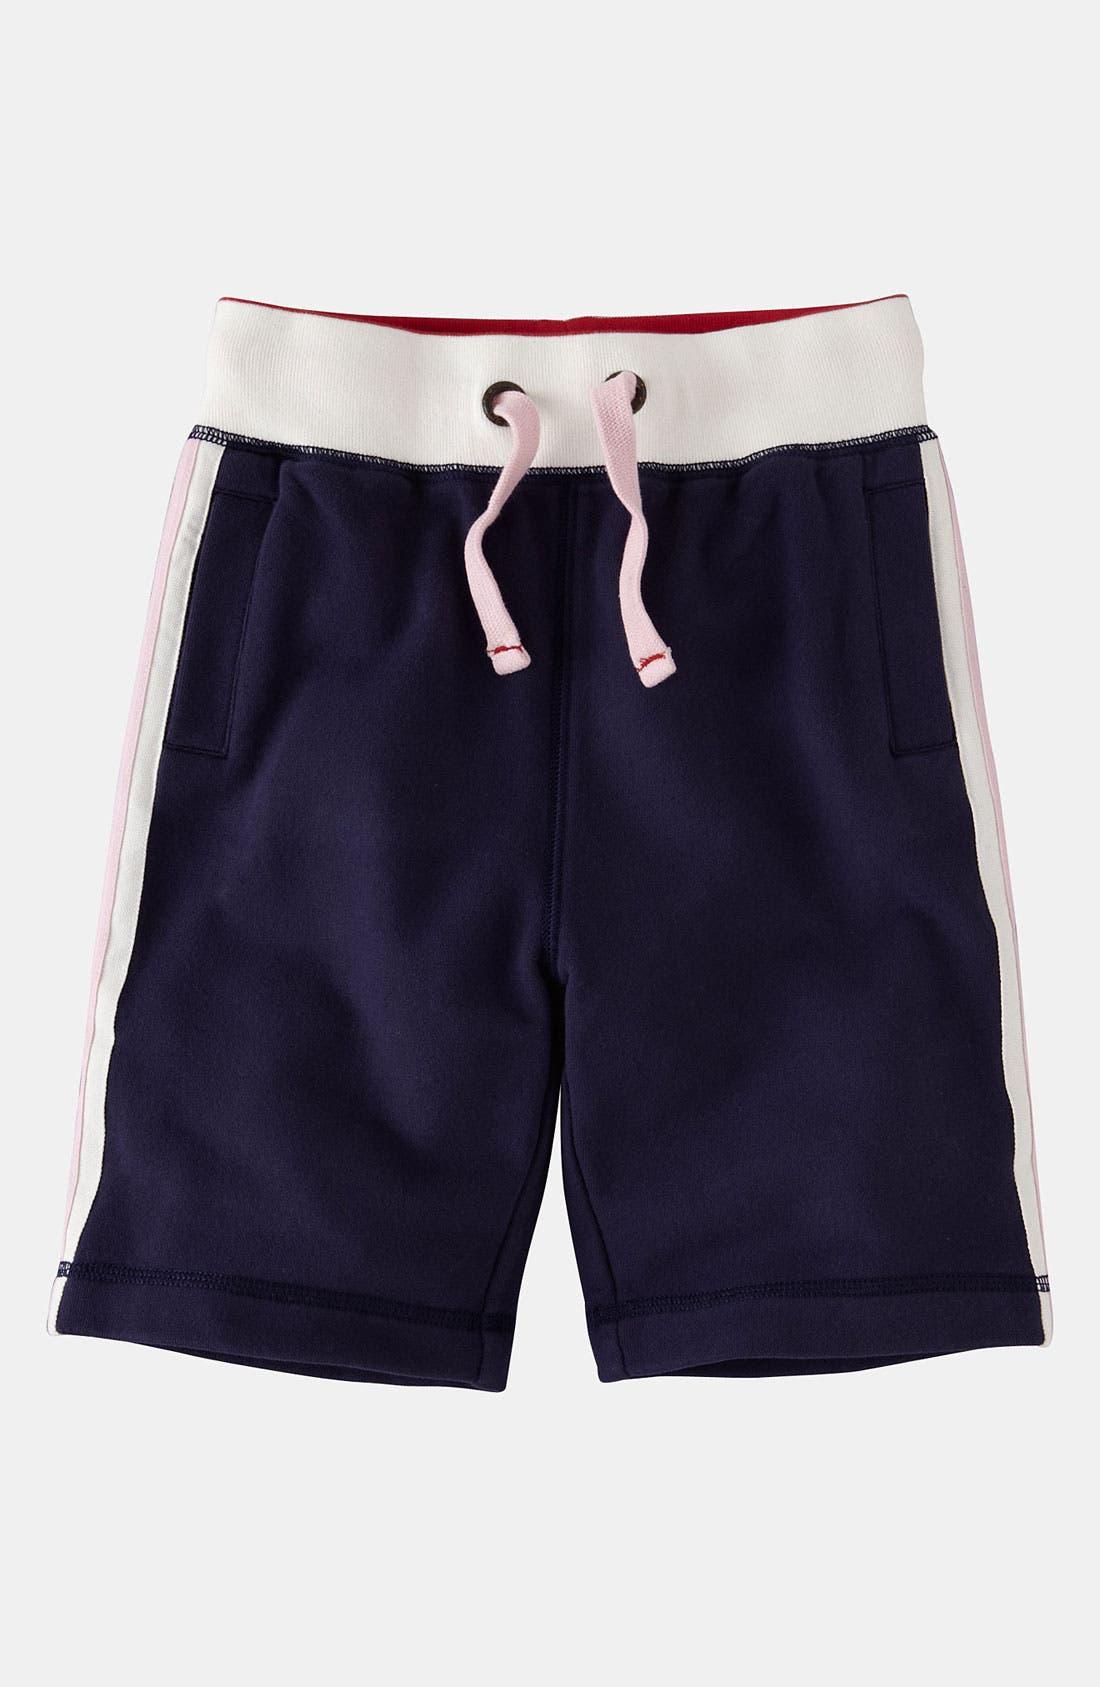 Alternate Image 1 Selected - Johnnie b Jersey Shorts (Big Boys)